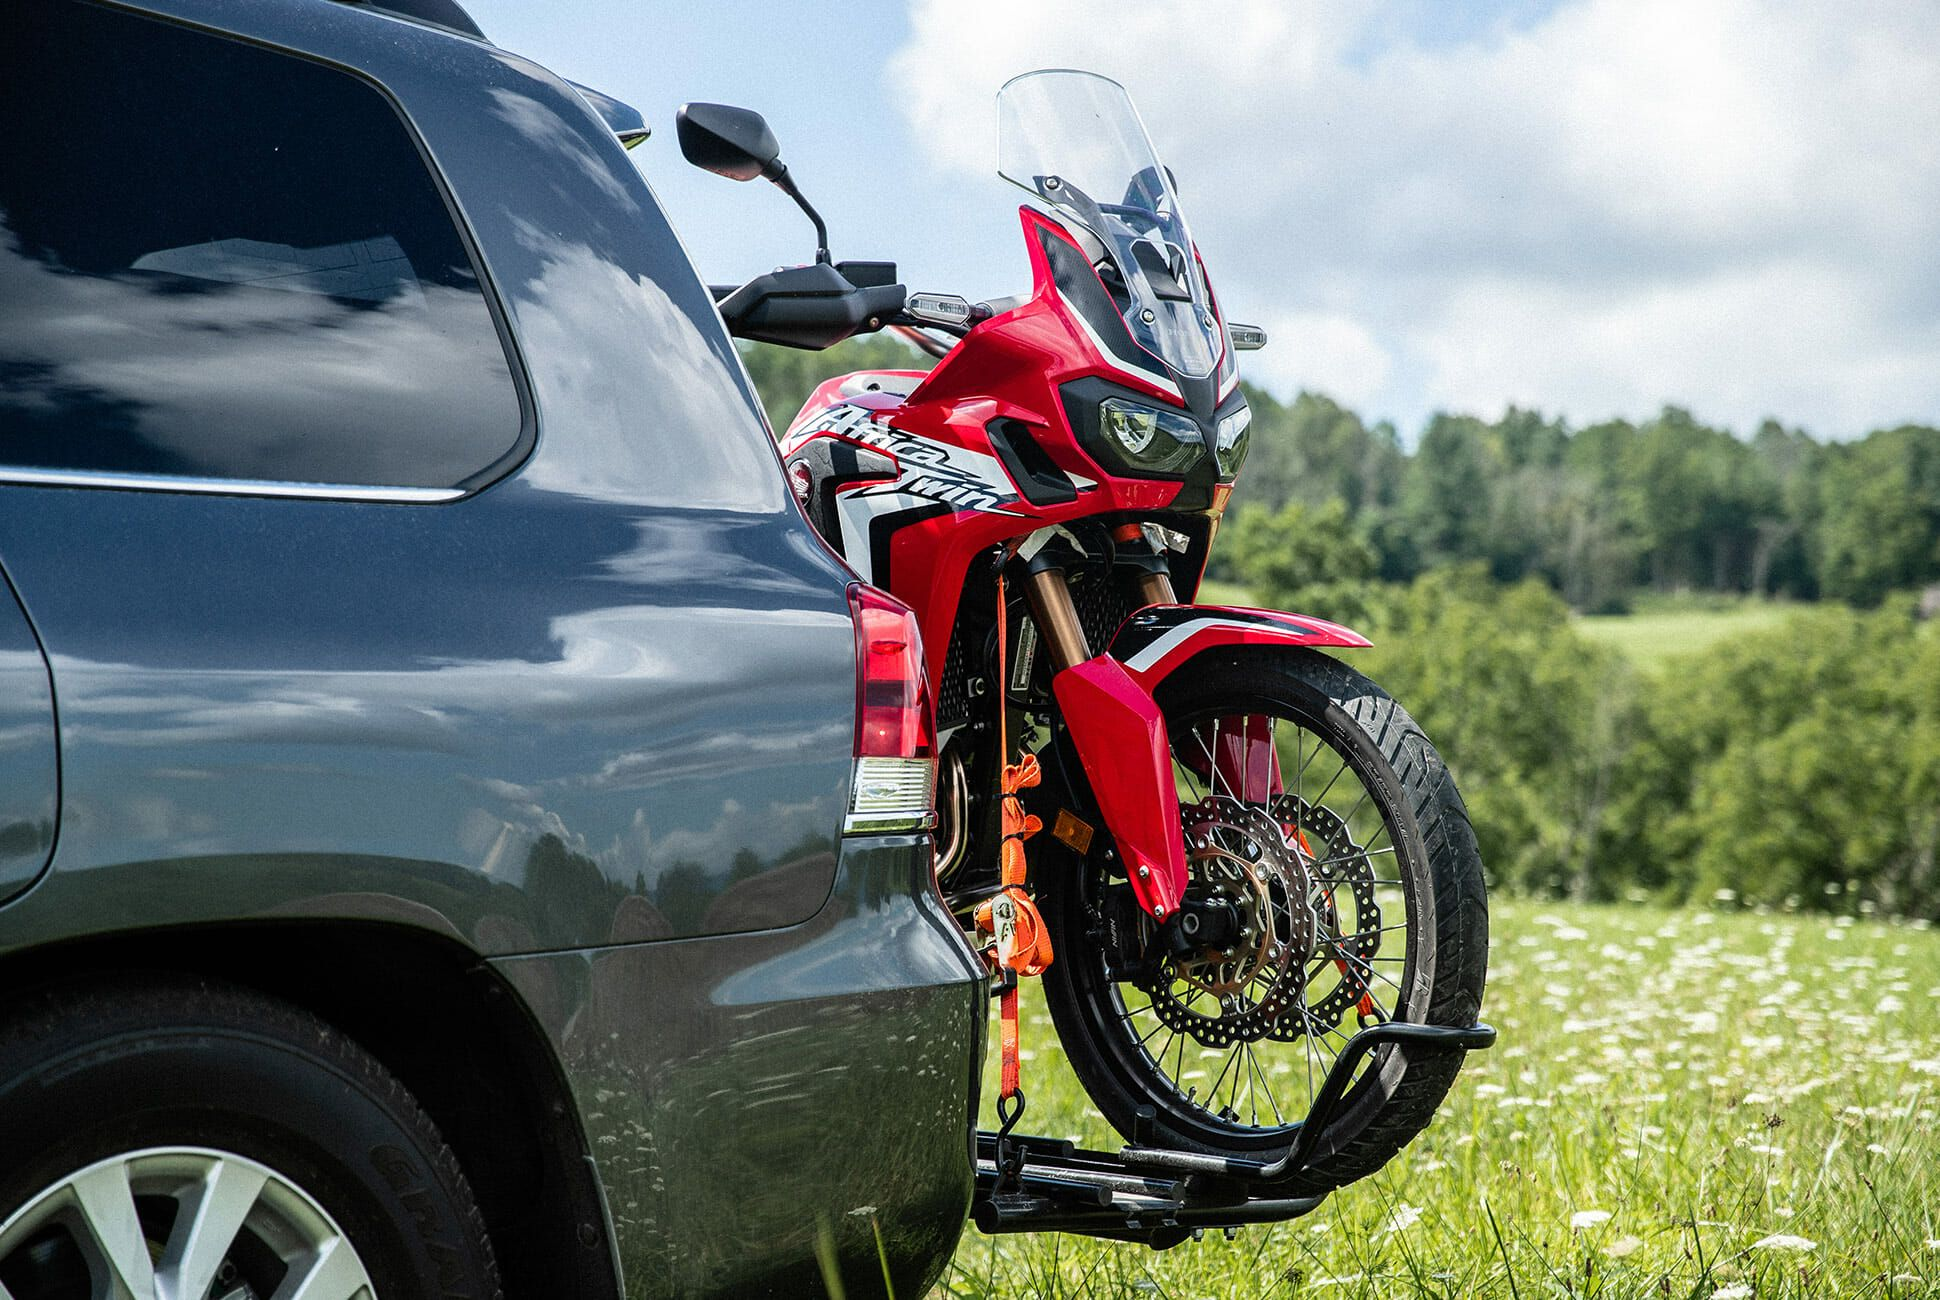 Toyota-Land-Cruiser-Op-Ed-gear-patrol-slide-2